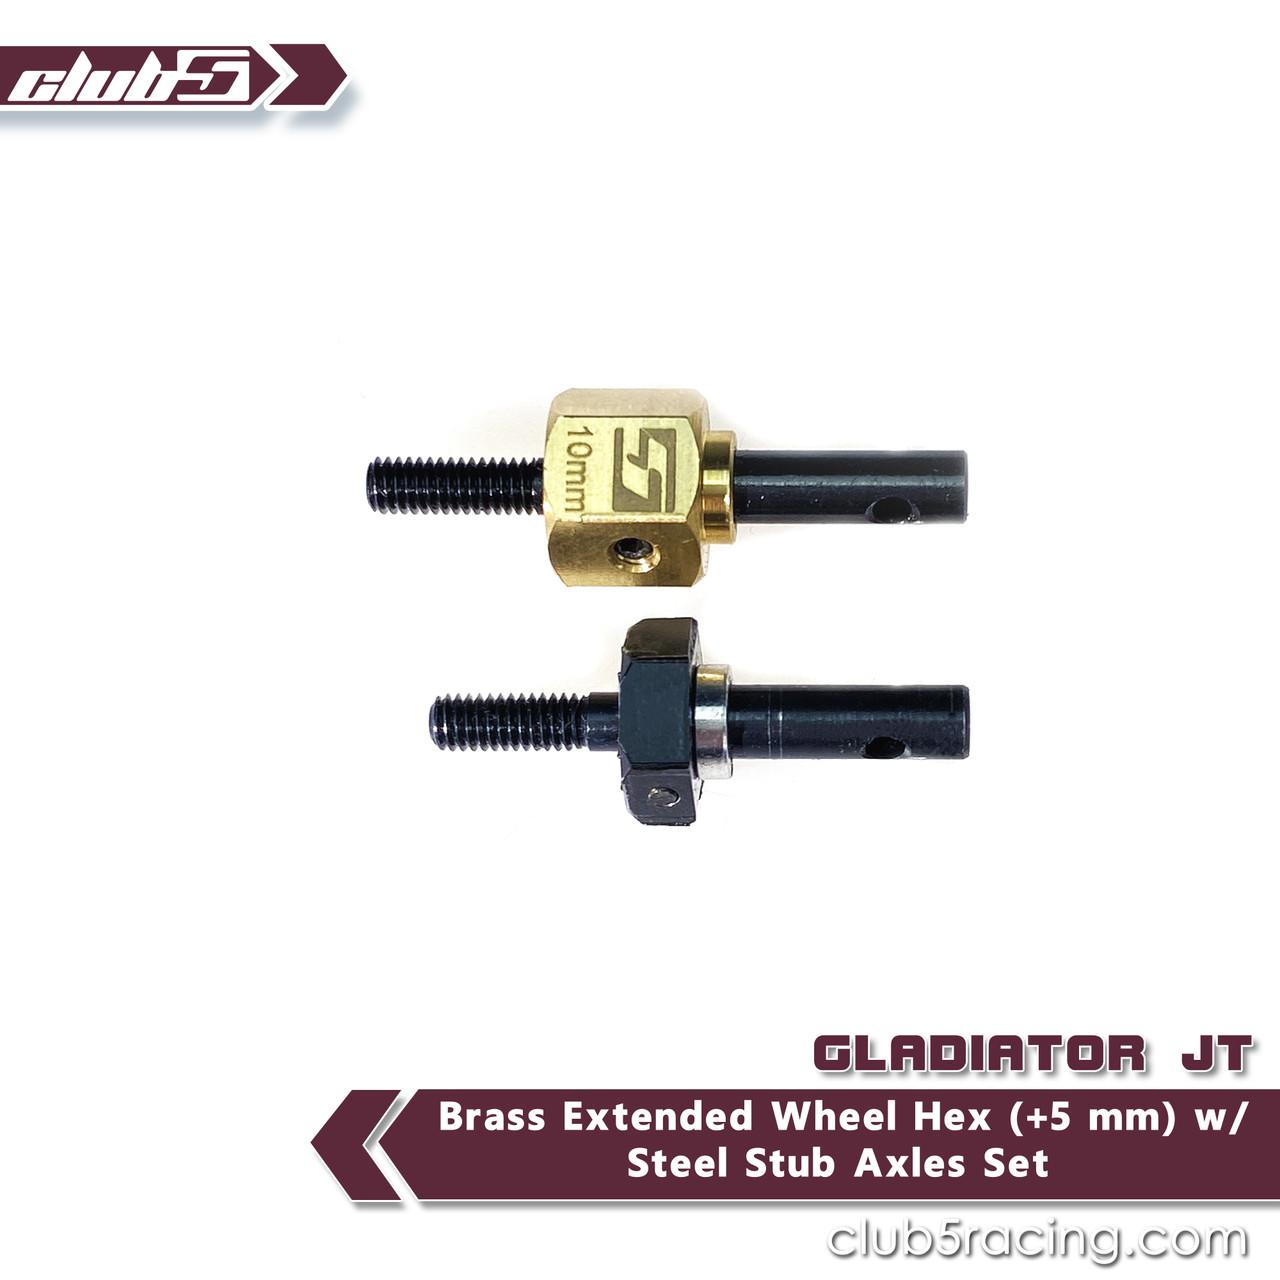 Brass Extended Wheel Hex (+10 mm) w/ Steel Stub Axles Set for SCX10 III Jeep JL Wrangler / JT Gladiator